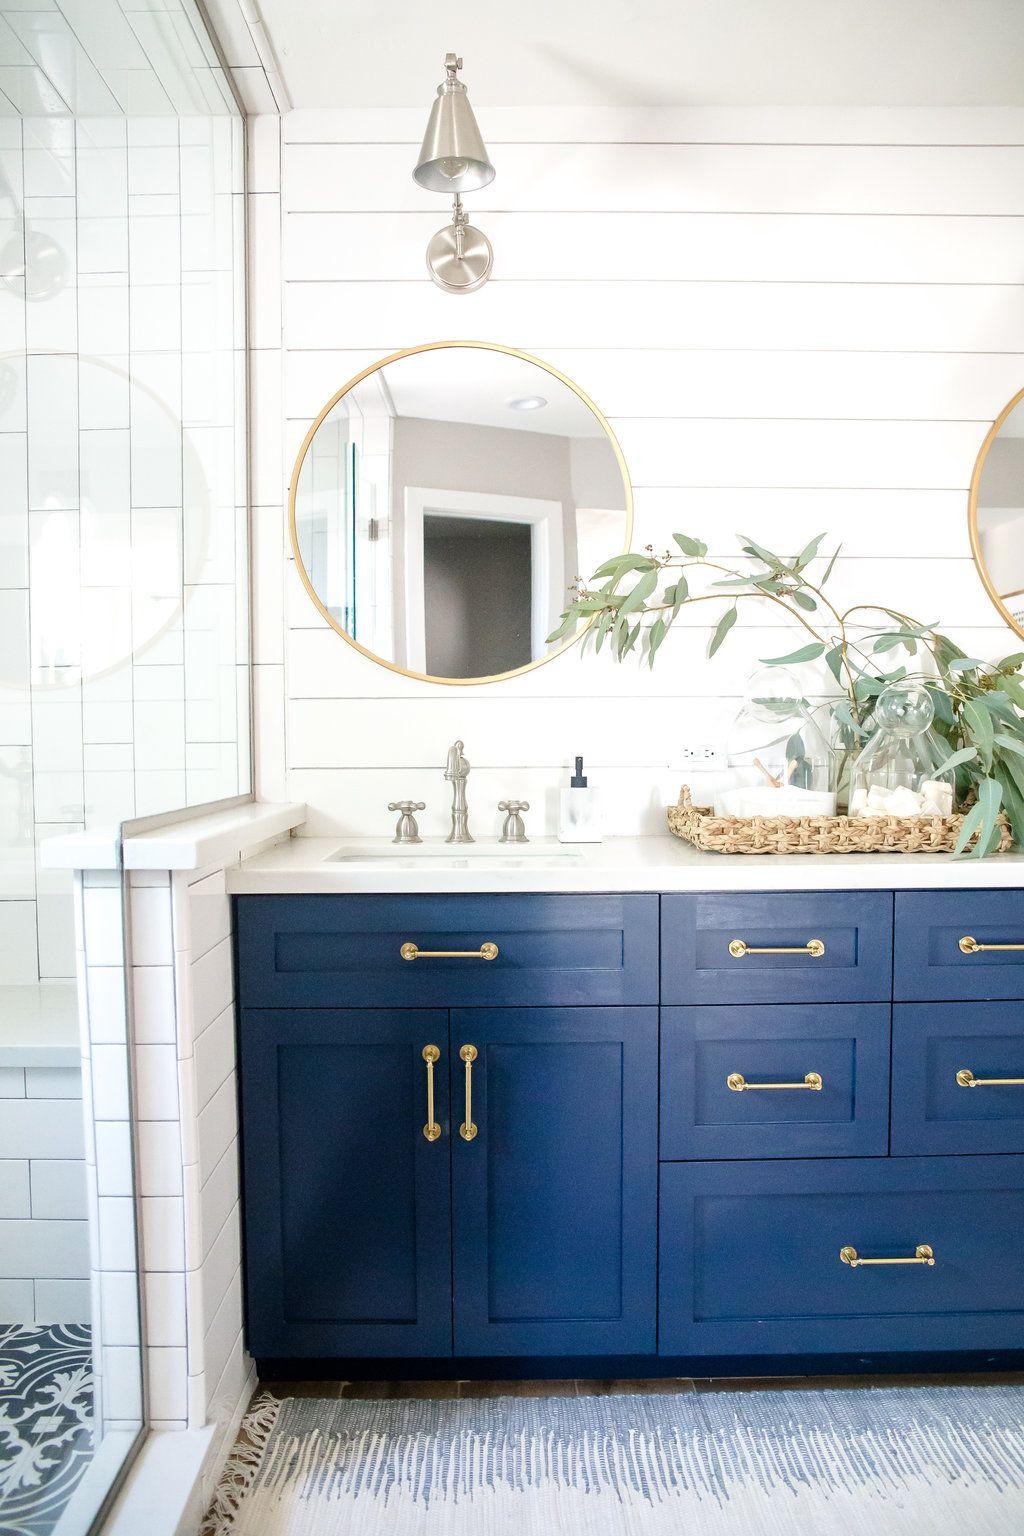 Casadeleeproject Bathroom Lead Design Lifestyledco Photos Natalieryanphotoaz Lifesty Blue Bathroom Vanity Unique Bathroom Vanity Unique Bathroom